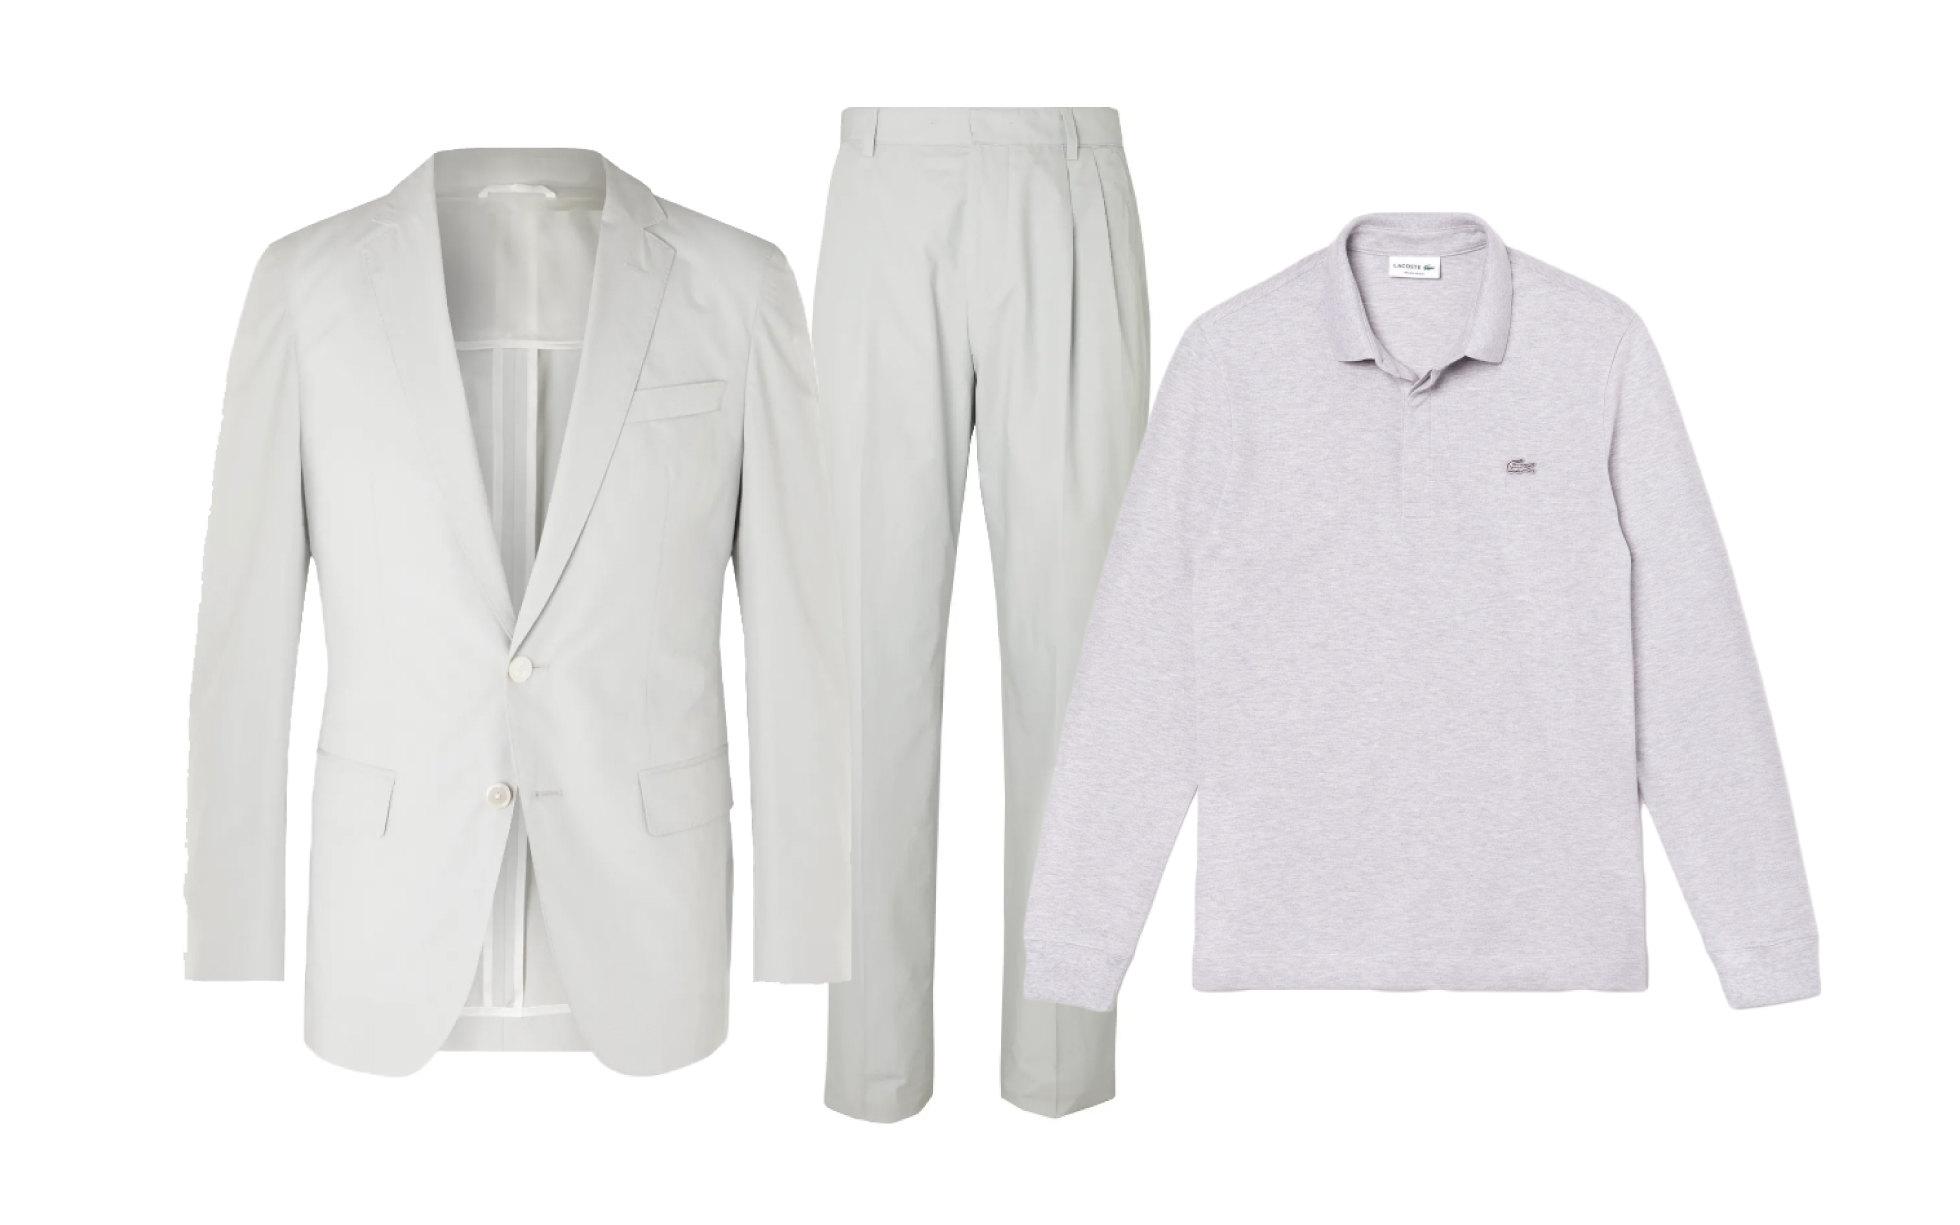 Пиджак Hugo Boss, $645; брюки Hugo Boss, $280; поло Lacoste, 10 480 руб.